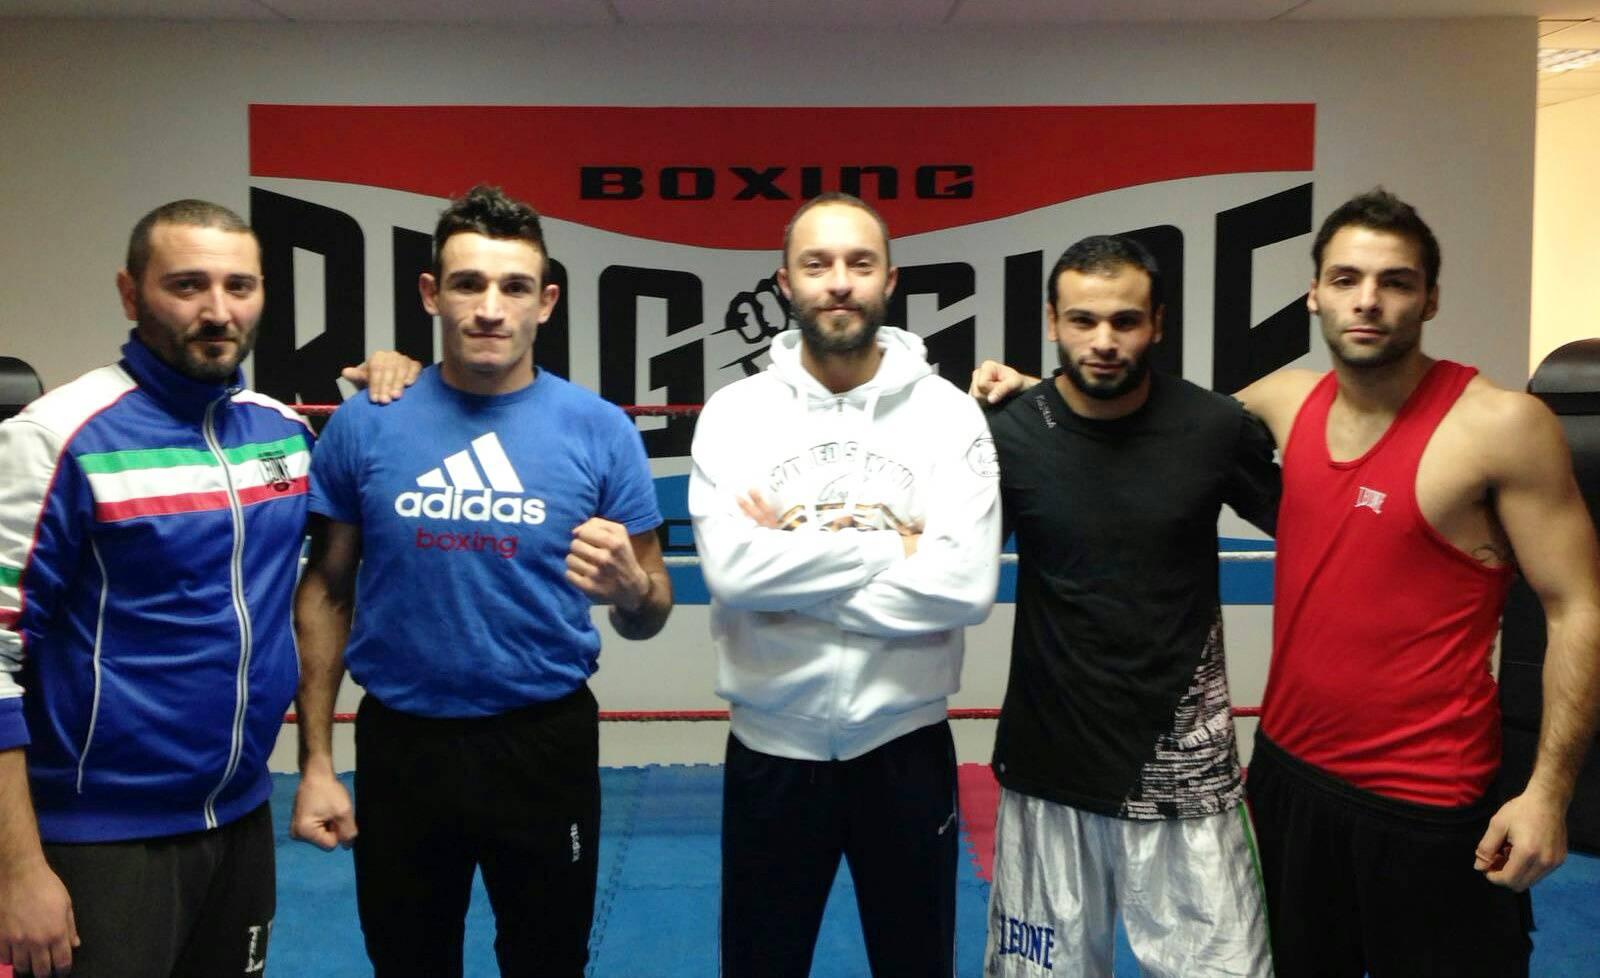 Ring Side Boxing Club di Rimini